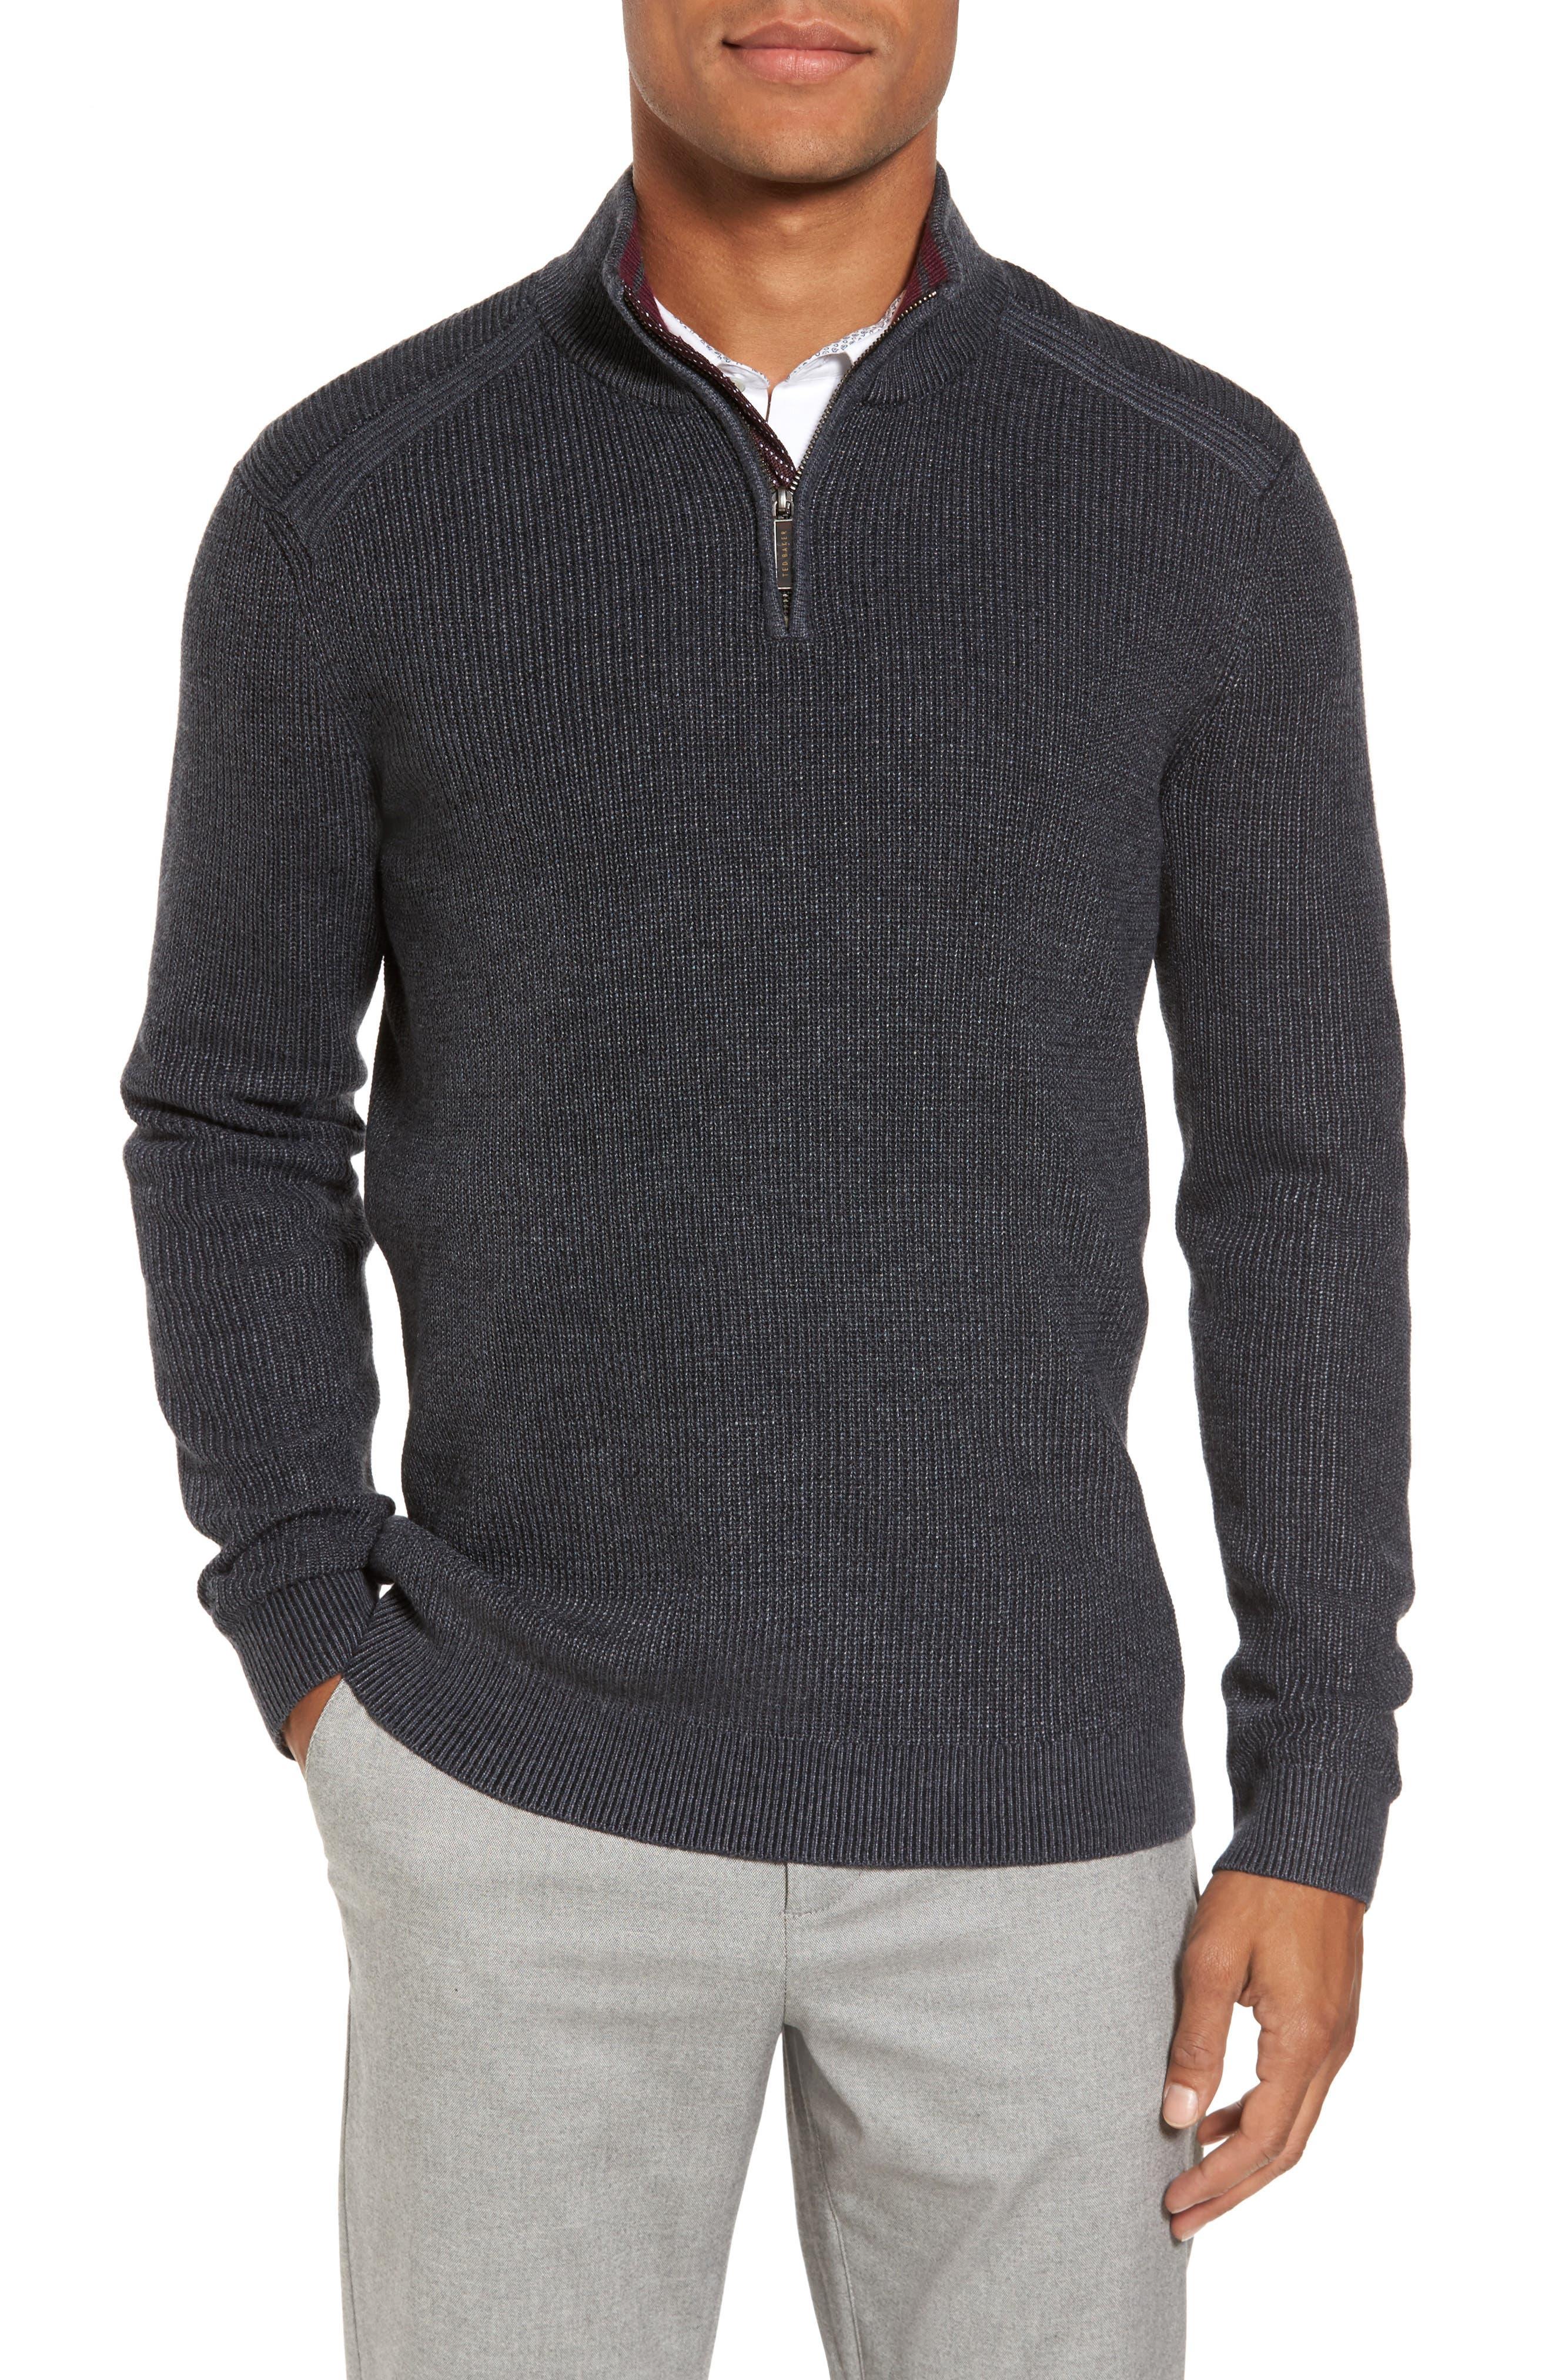 Stach Quarter Zip Sweater,                             Main thumbnail 1, color,                             010